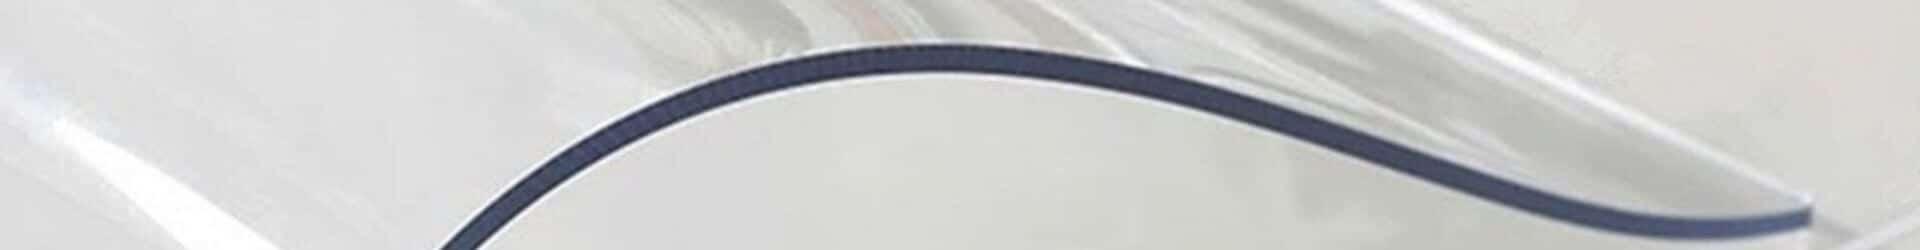 anand plastics, polycarbonate sheet, solid polycarbnoate sheet, multiwall polycarbonate sheet, roofing sheets, canopy sheet, plastic sheet, acrylic sheet, lgp, abs sheet, petg, sunboard, polystyrene sheets